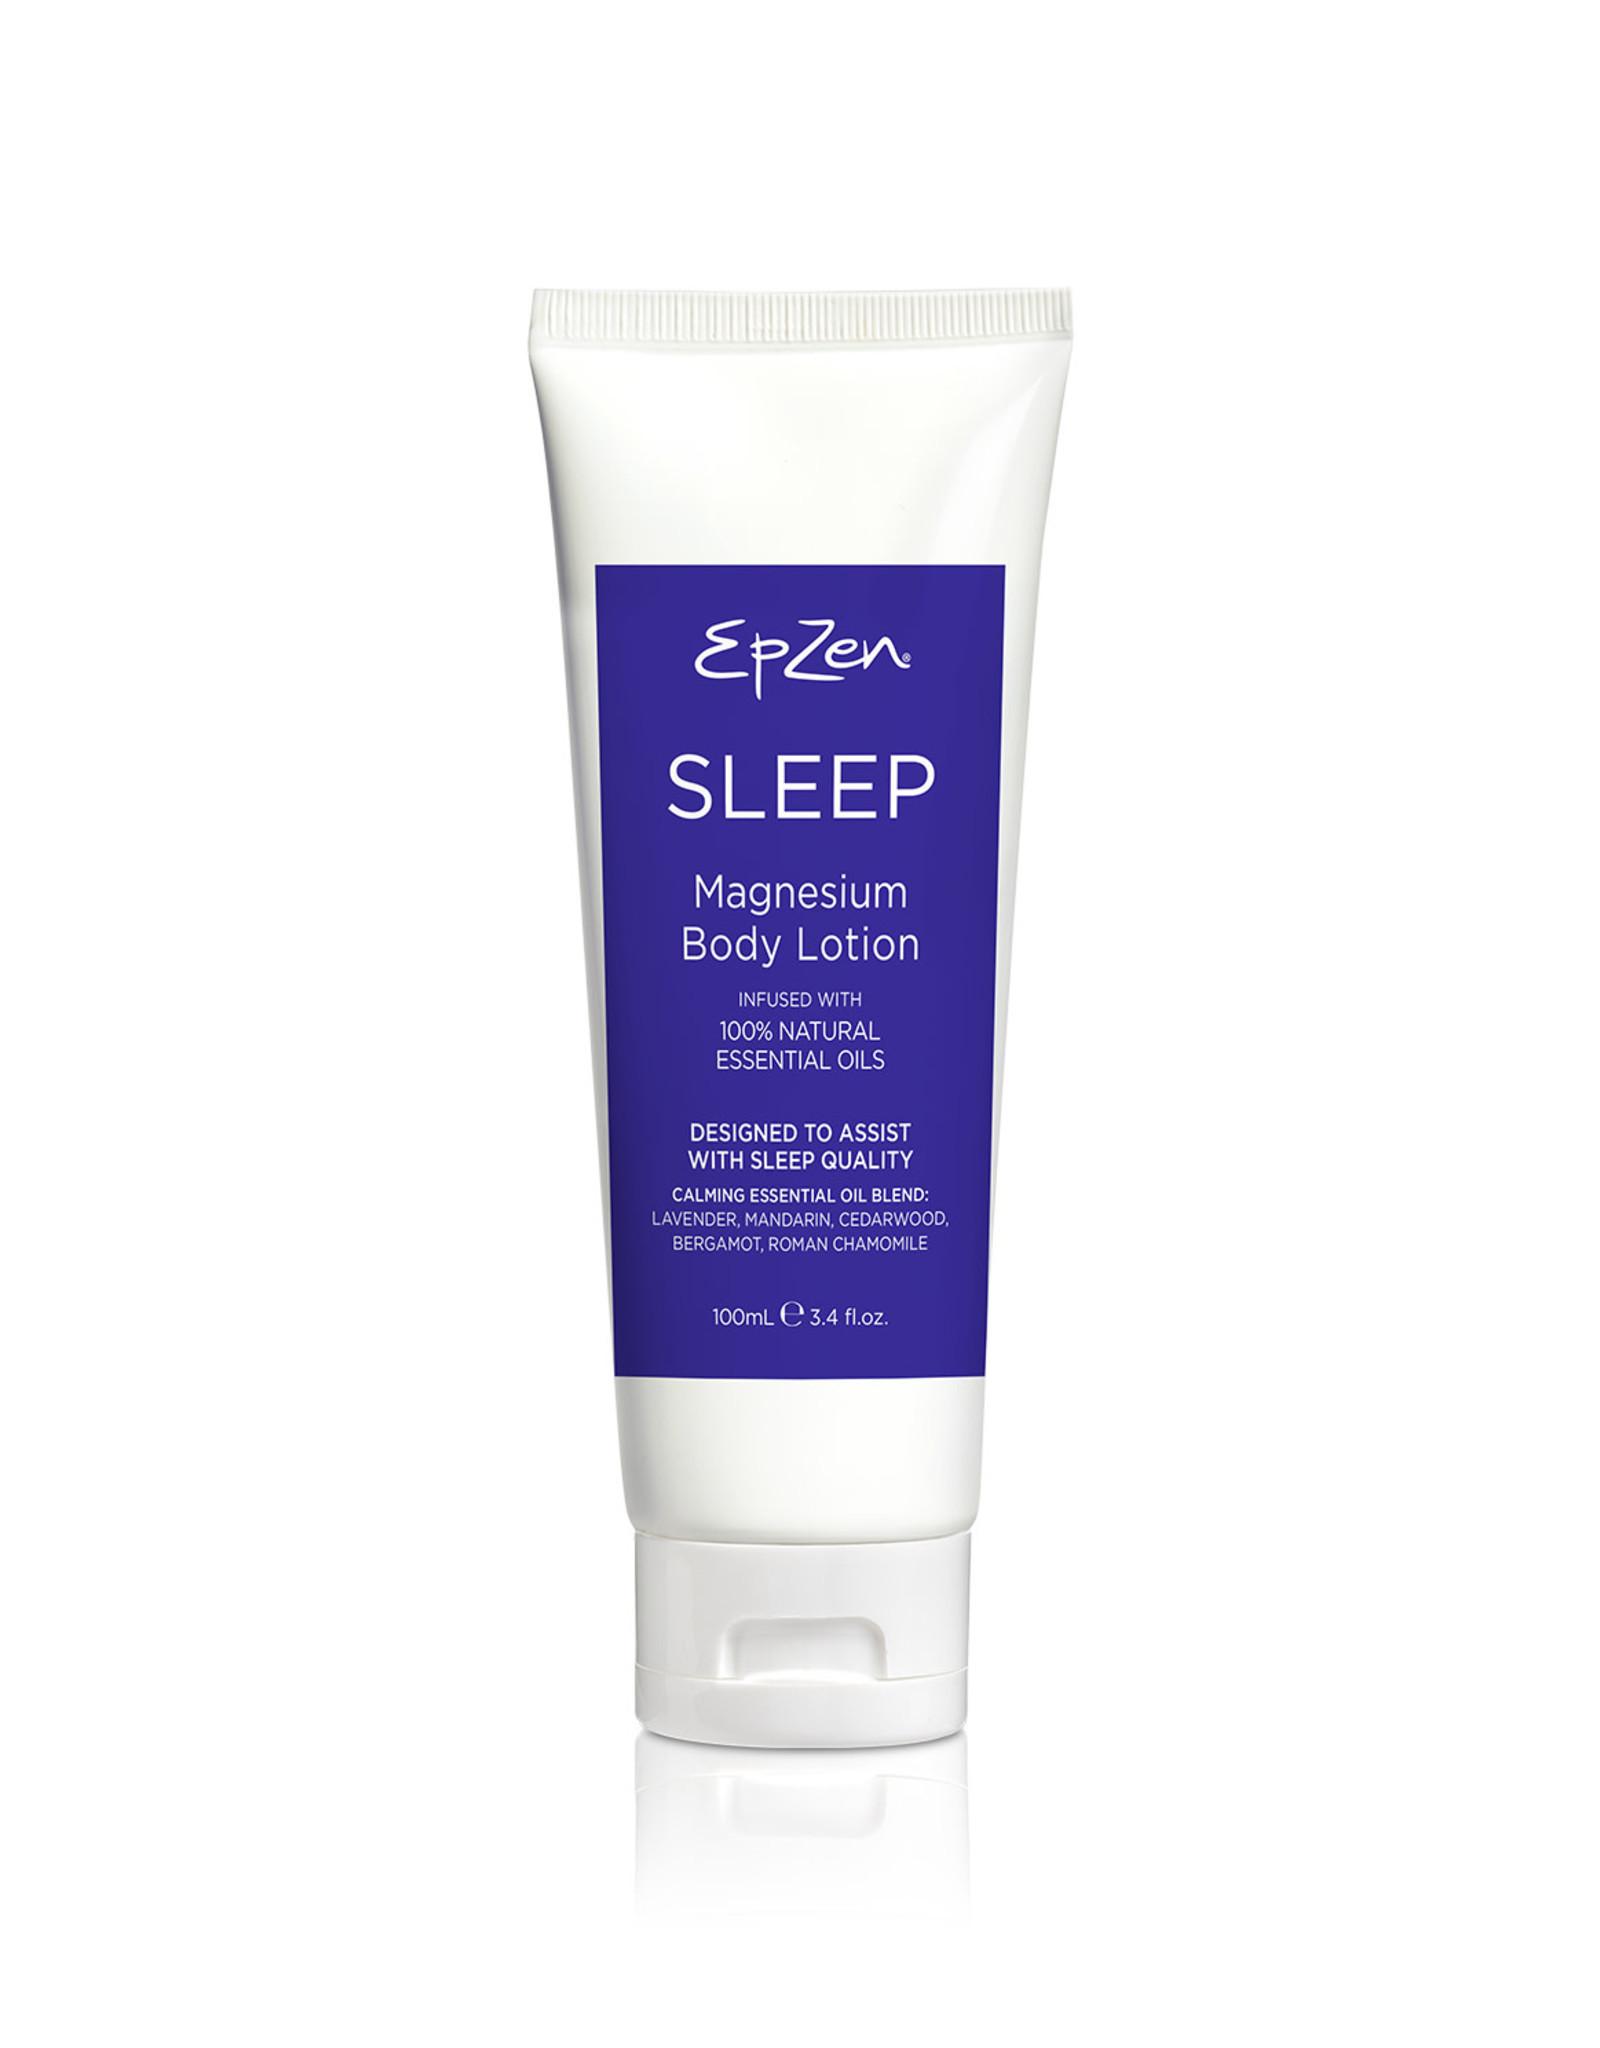 Evodia Magnesium Body Lotion - Sleep - 100ml